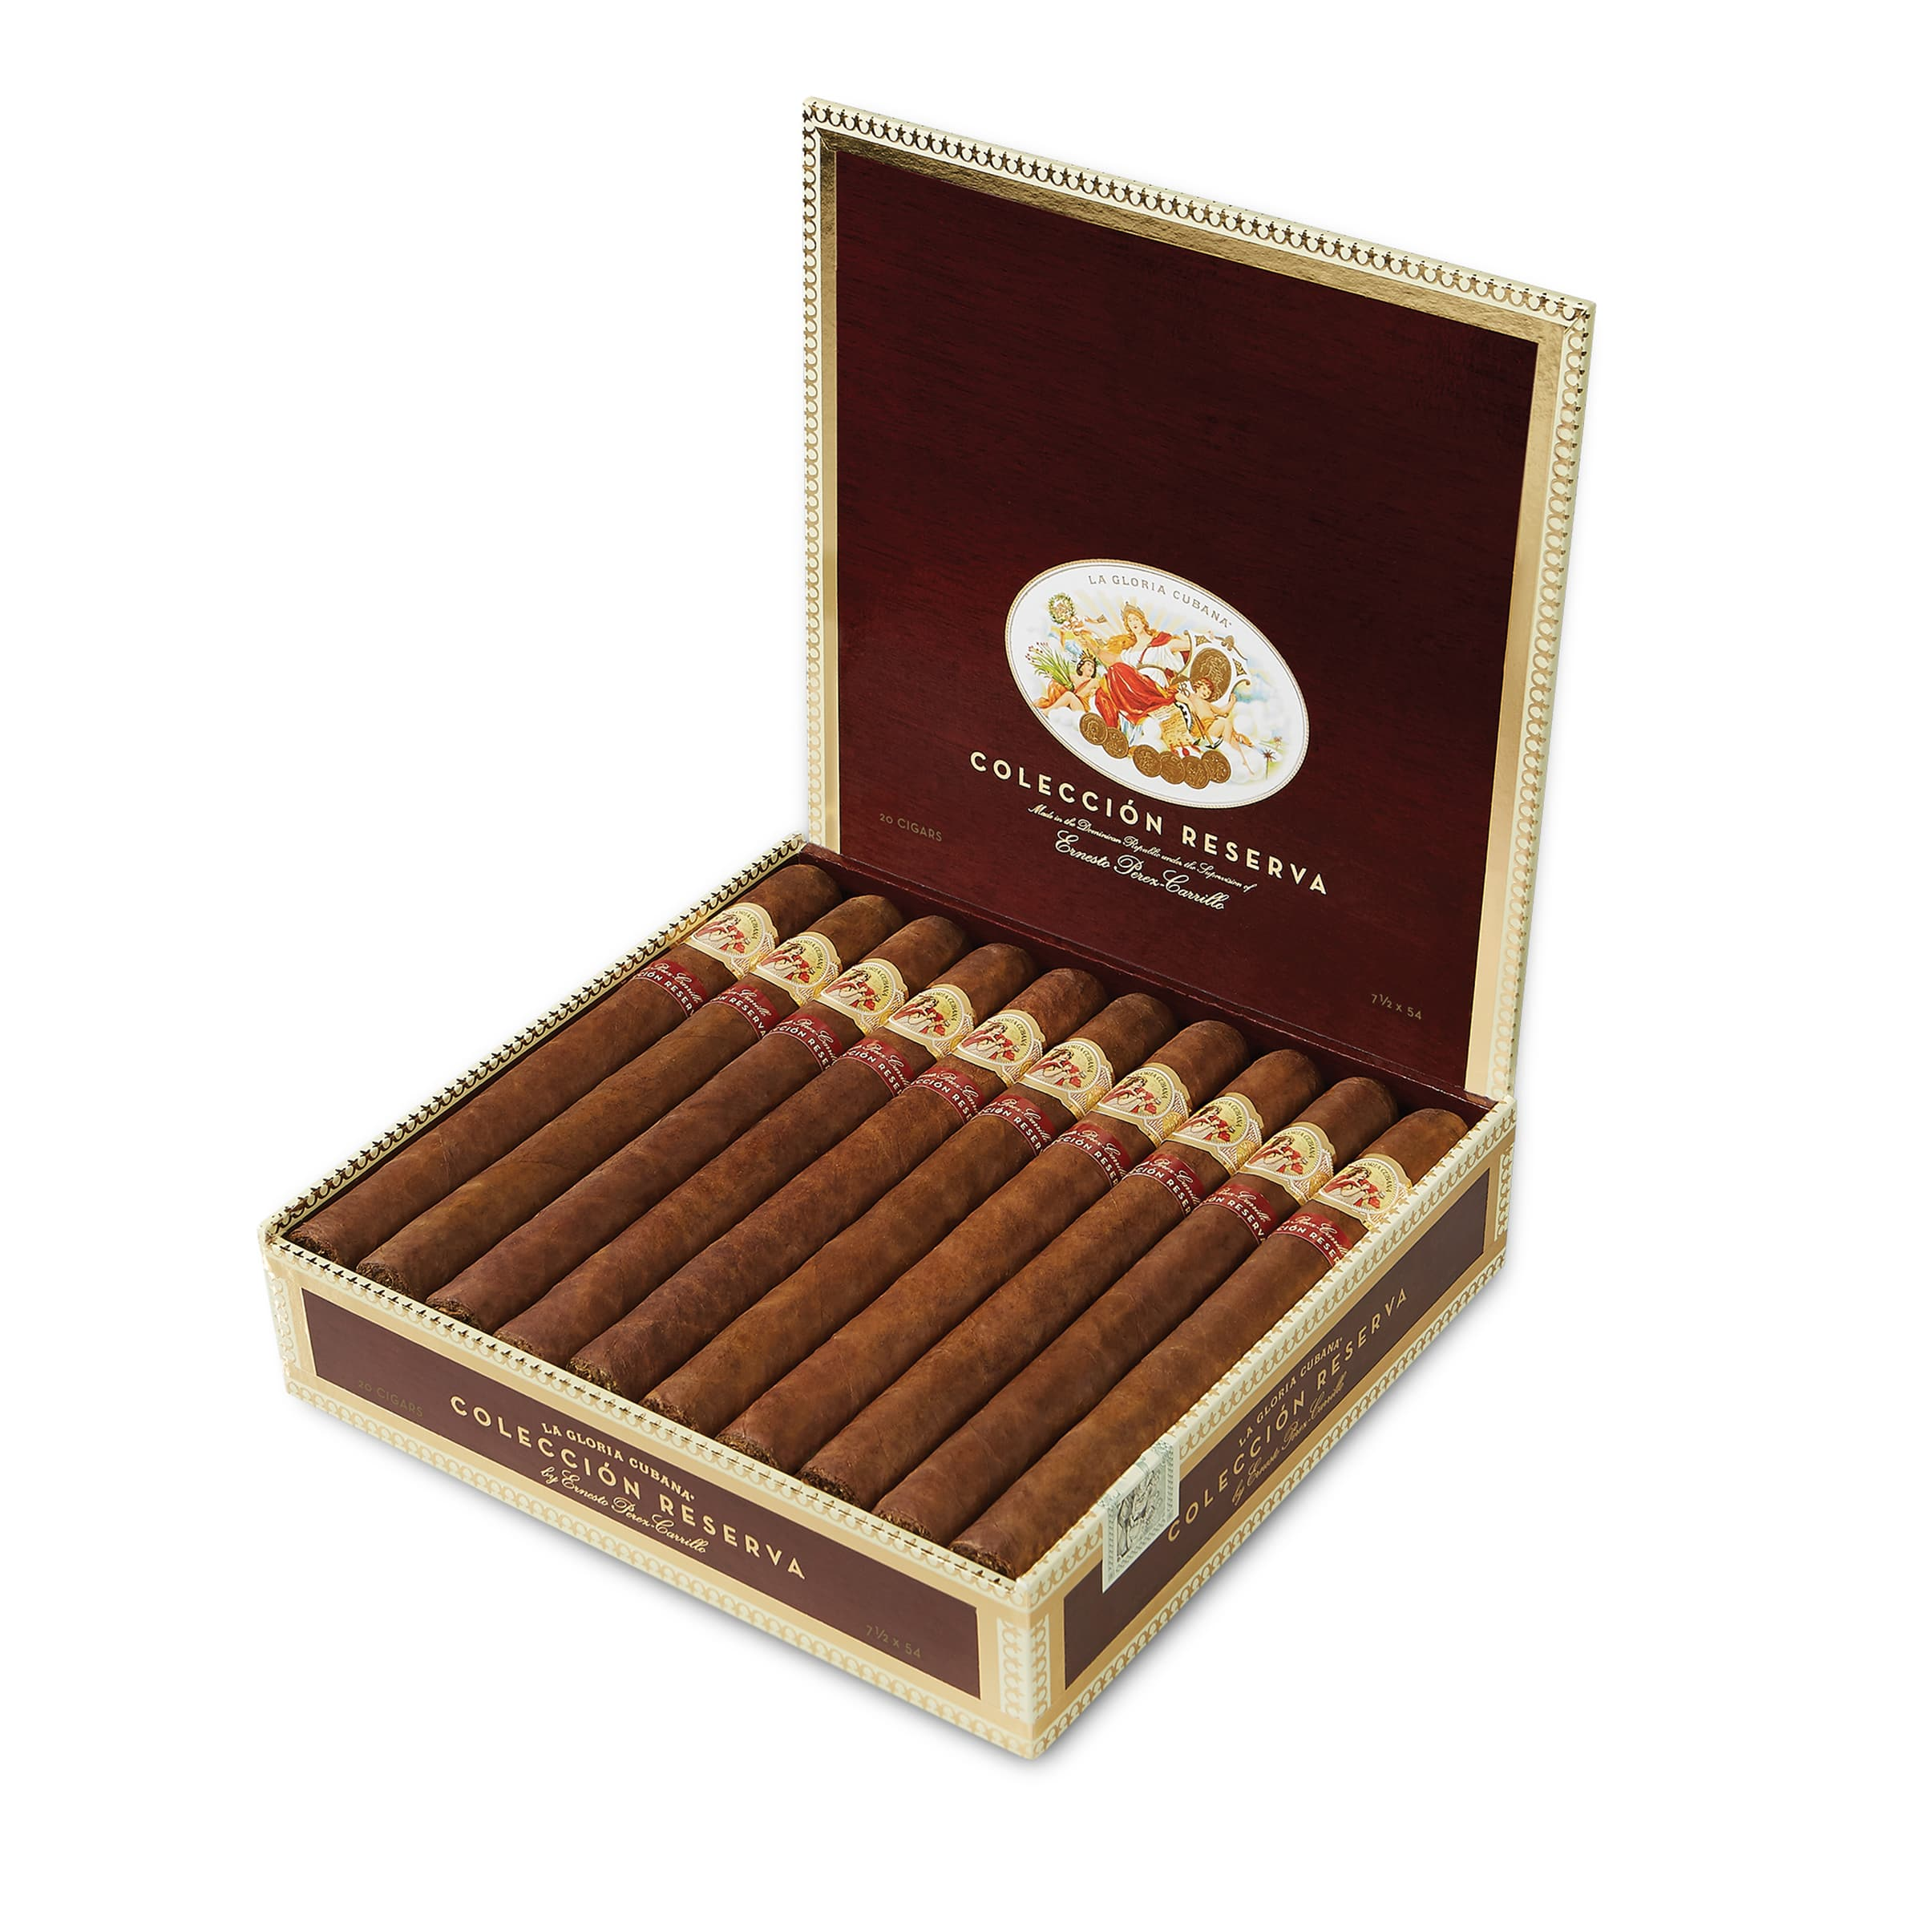 La Gloria Cubana Colección Reserva cigar box open